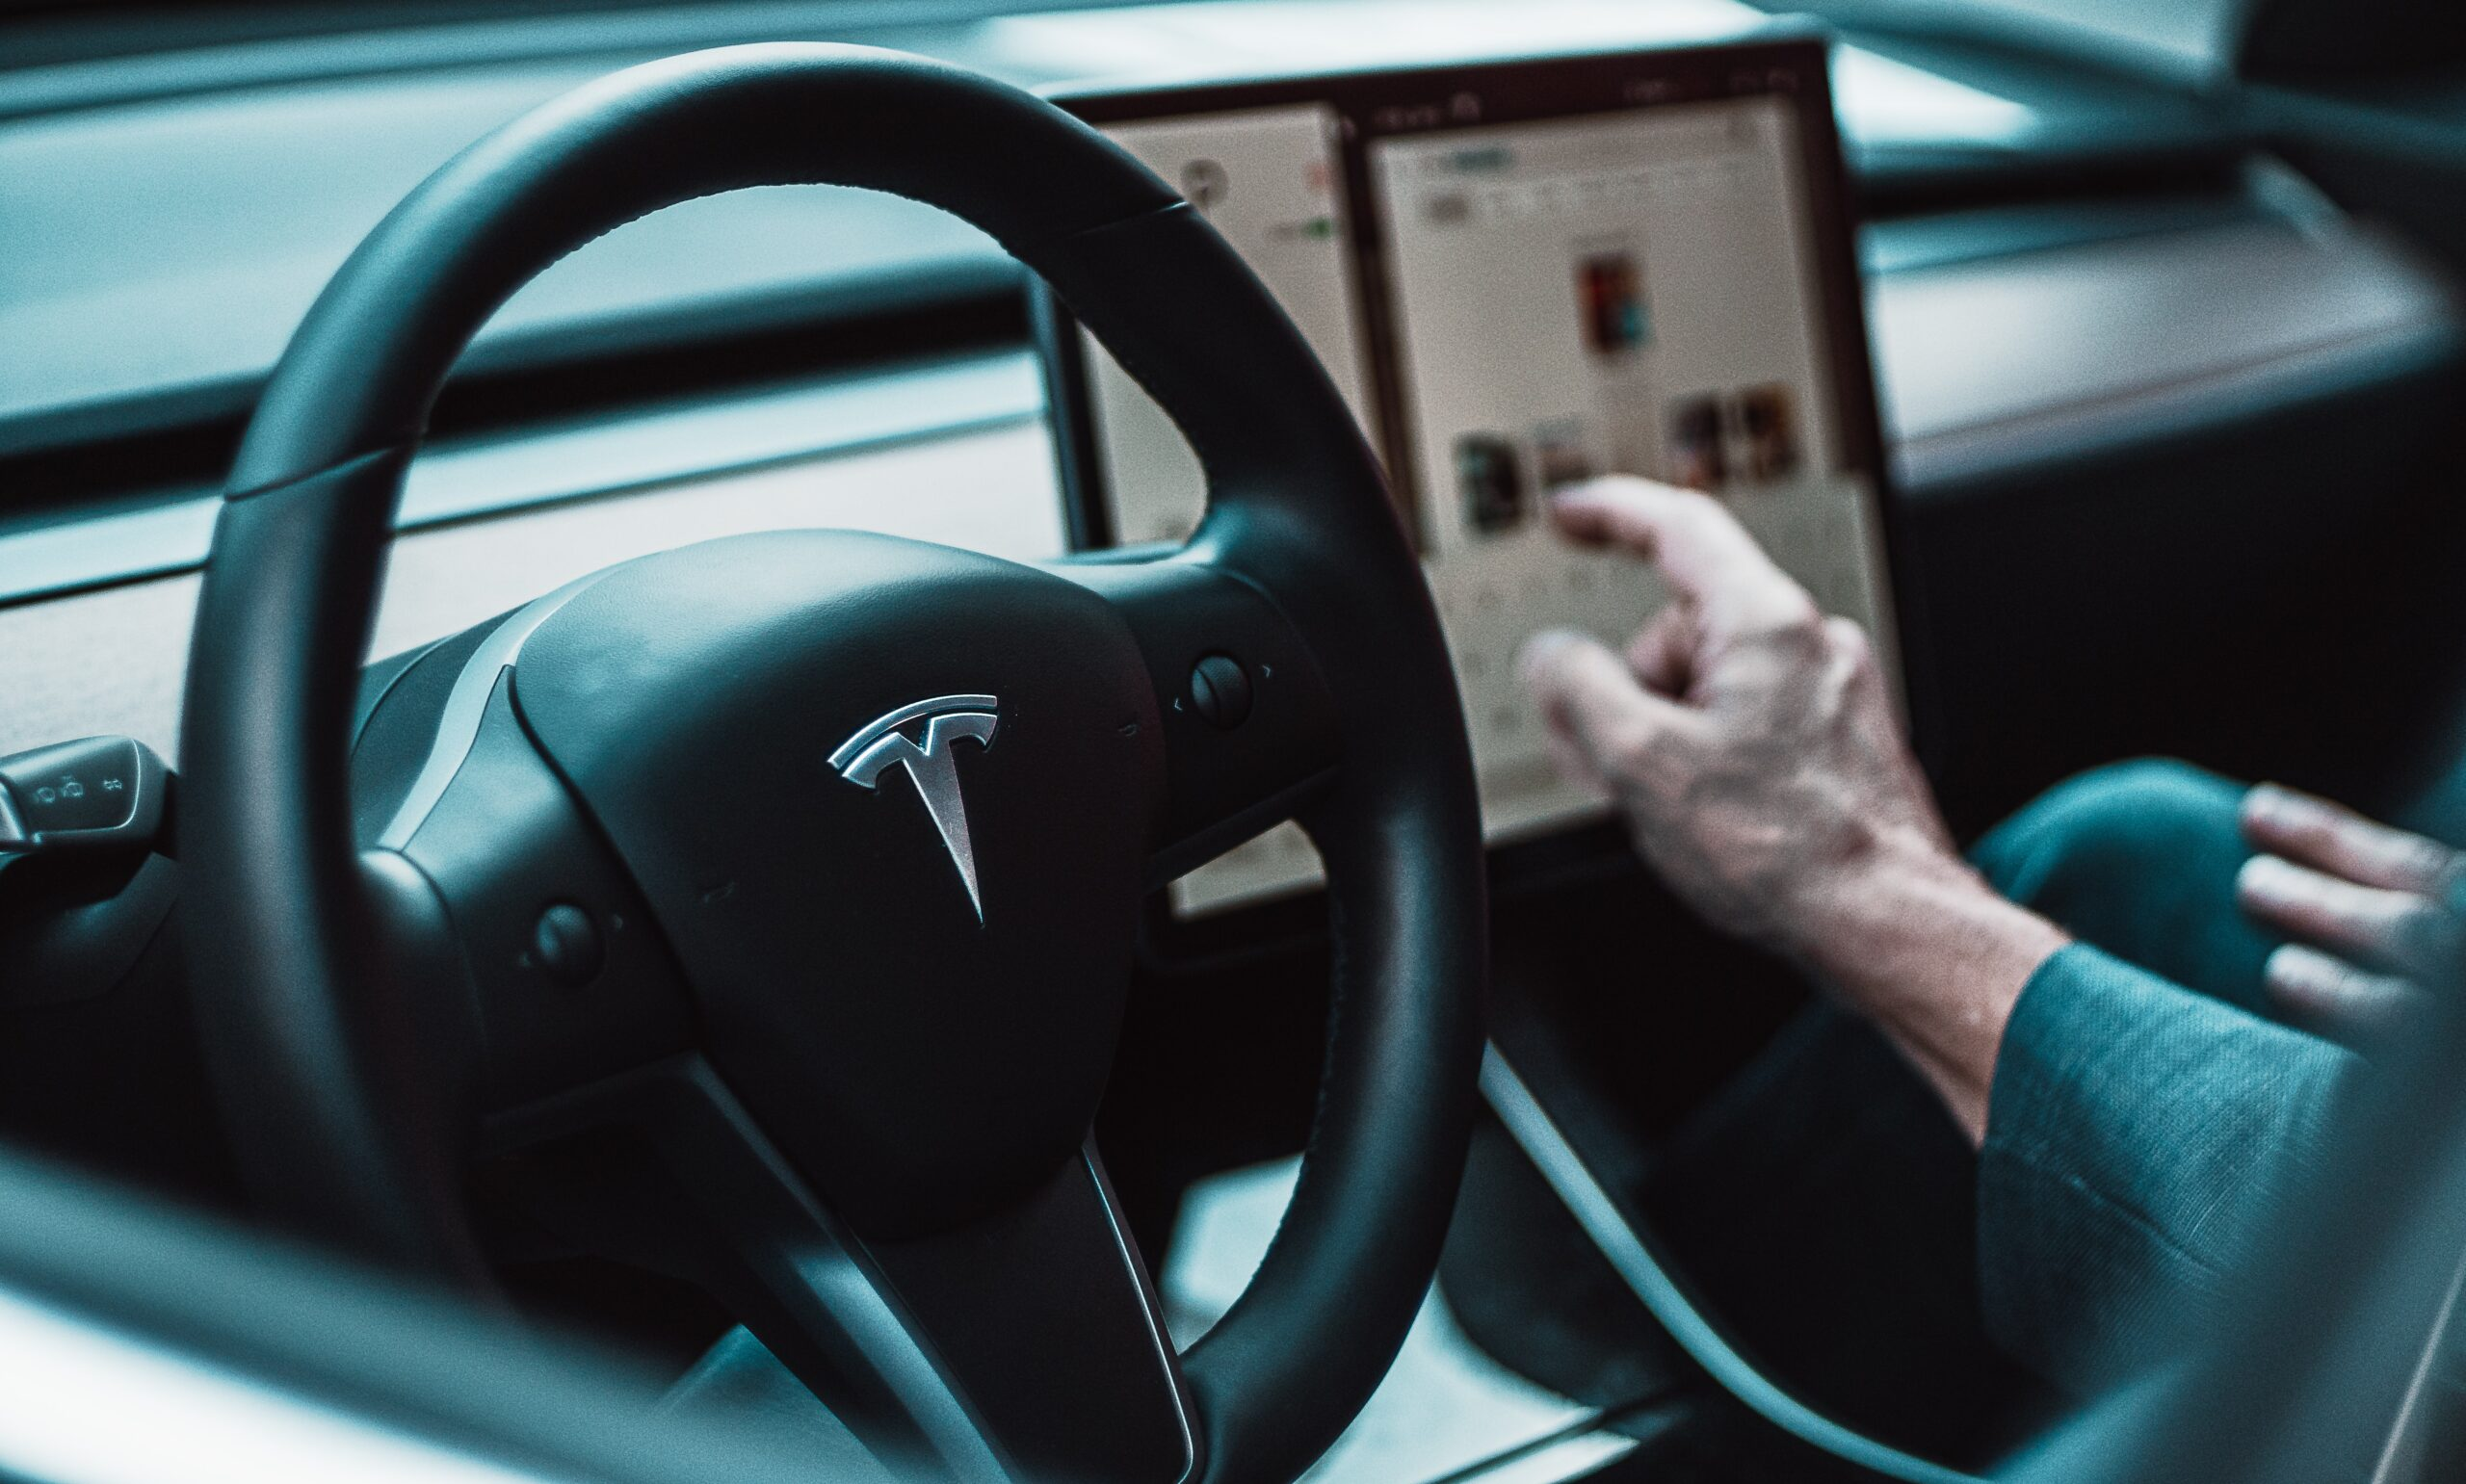 david-von-diemar-Tesla interior Model 3 black steering wheel and Tesla control display-unsplash